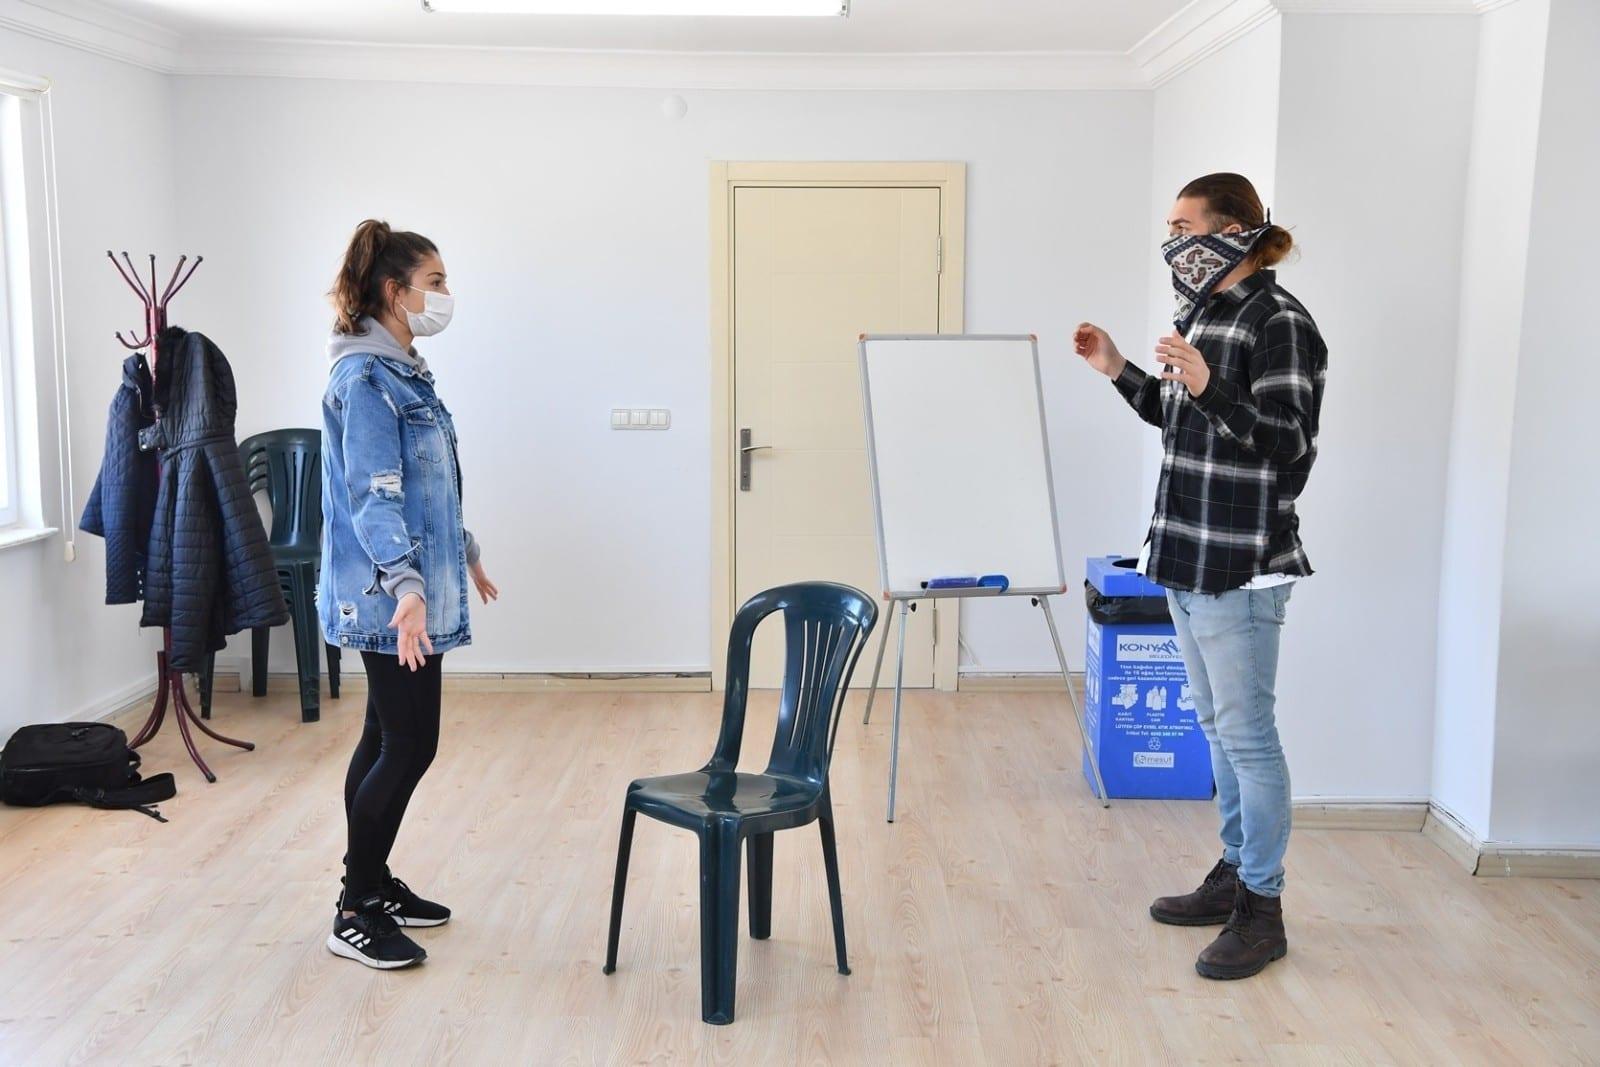 konyaalti belediyesinden ucretsiz tiyatro egitimi 0 ikdNdnlO